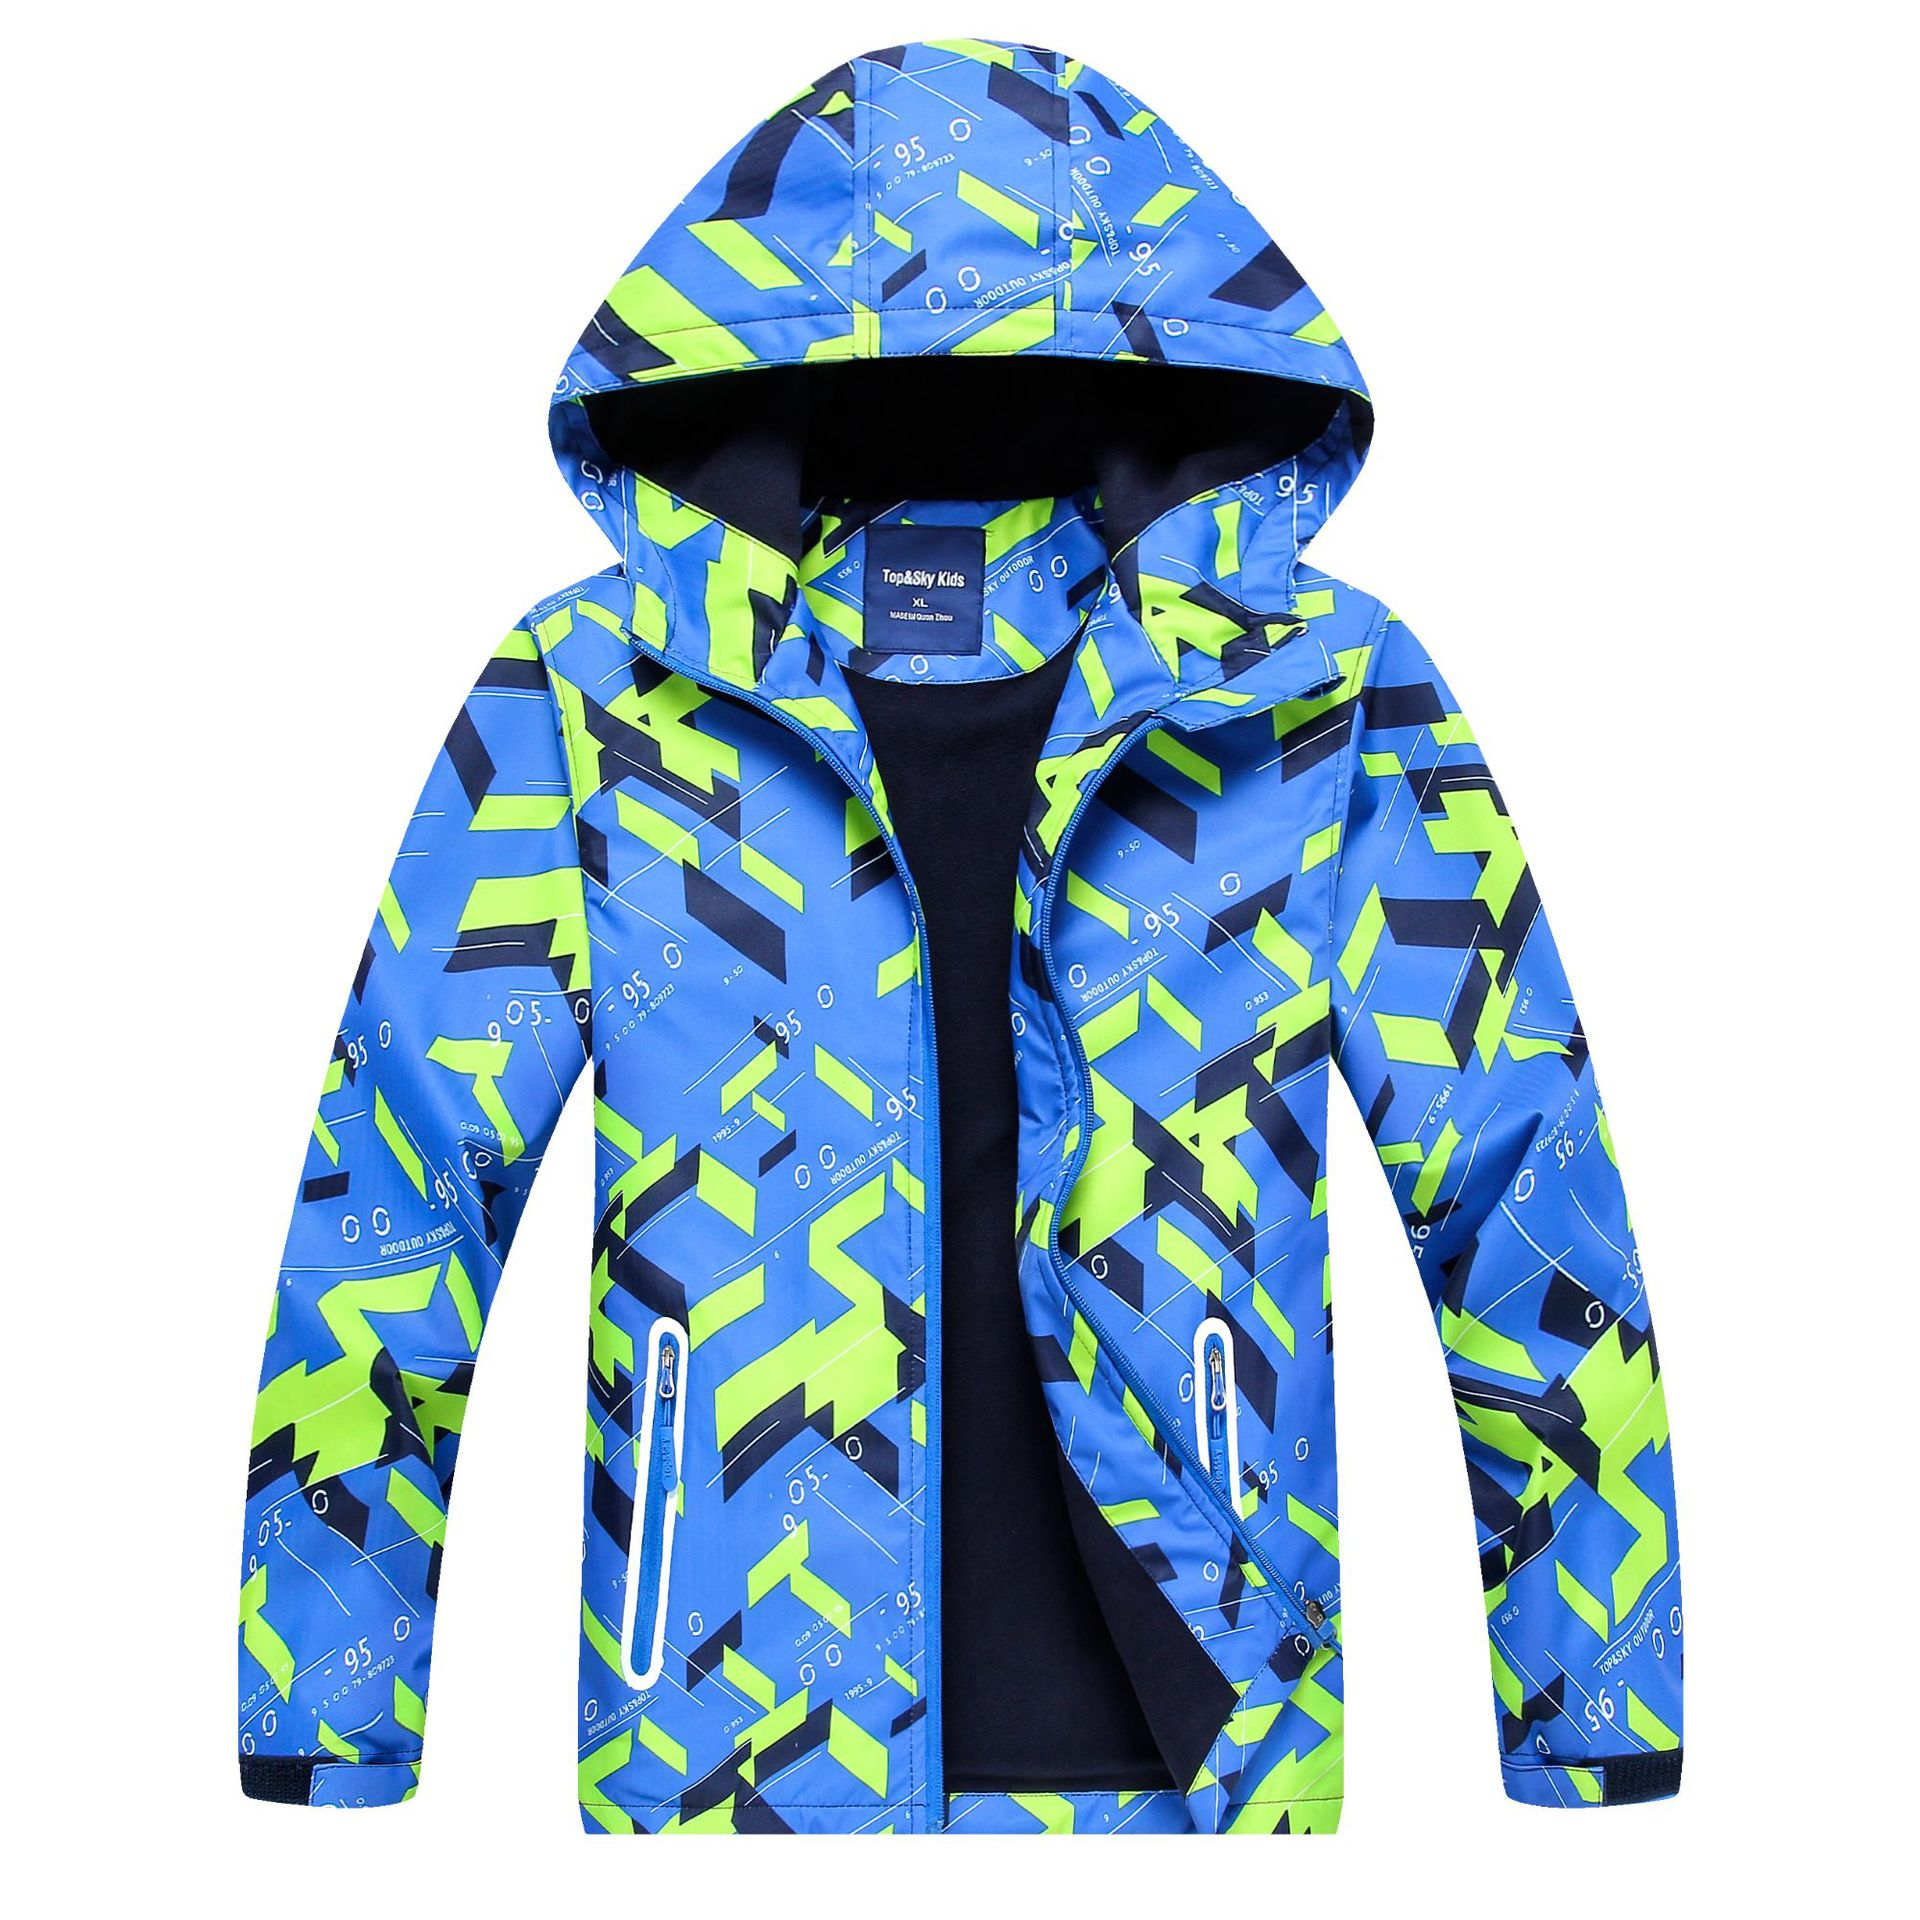 Children Reflective WaterProof Jacket For Boy Teenage Kids Outerwear Spring Autumn Warm Coat With Fleece Hoodies T35